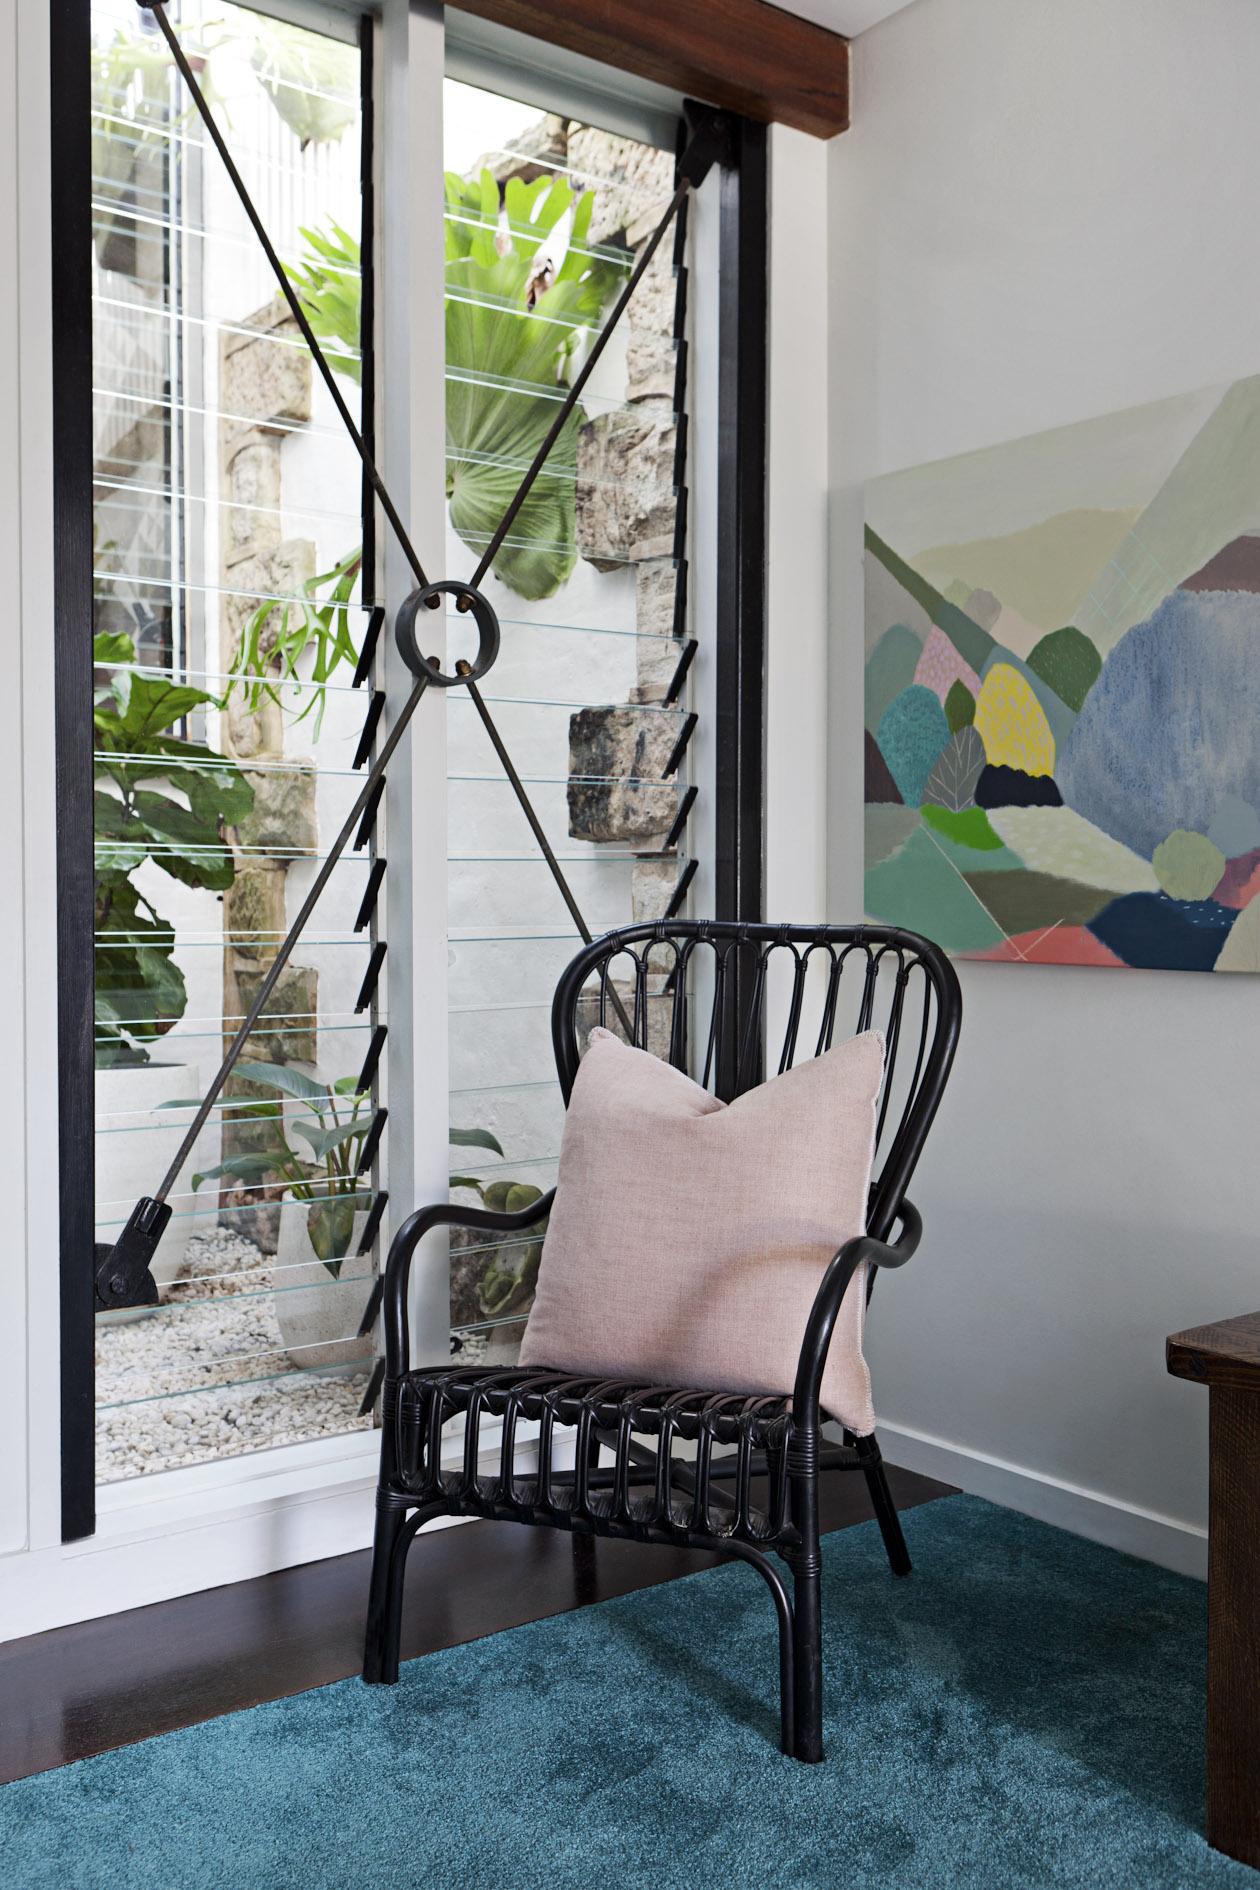 Baron Cottage by Trentini Design. Photography Amanda Prior.